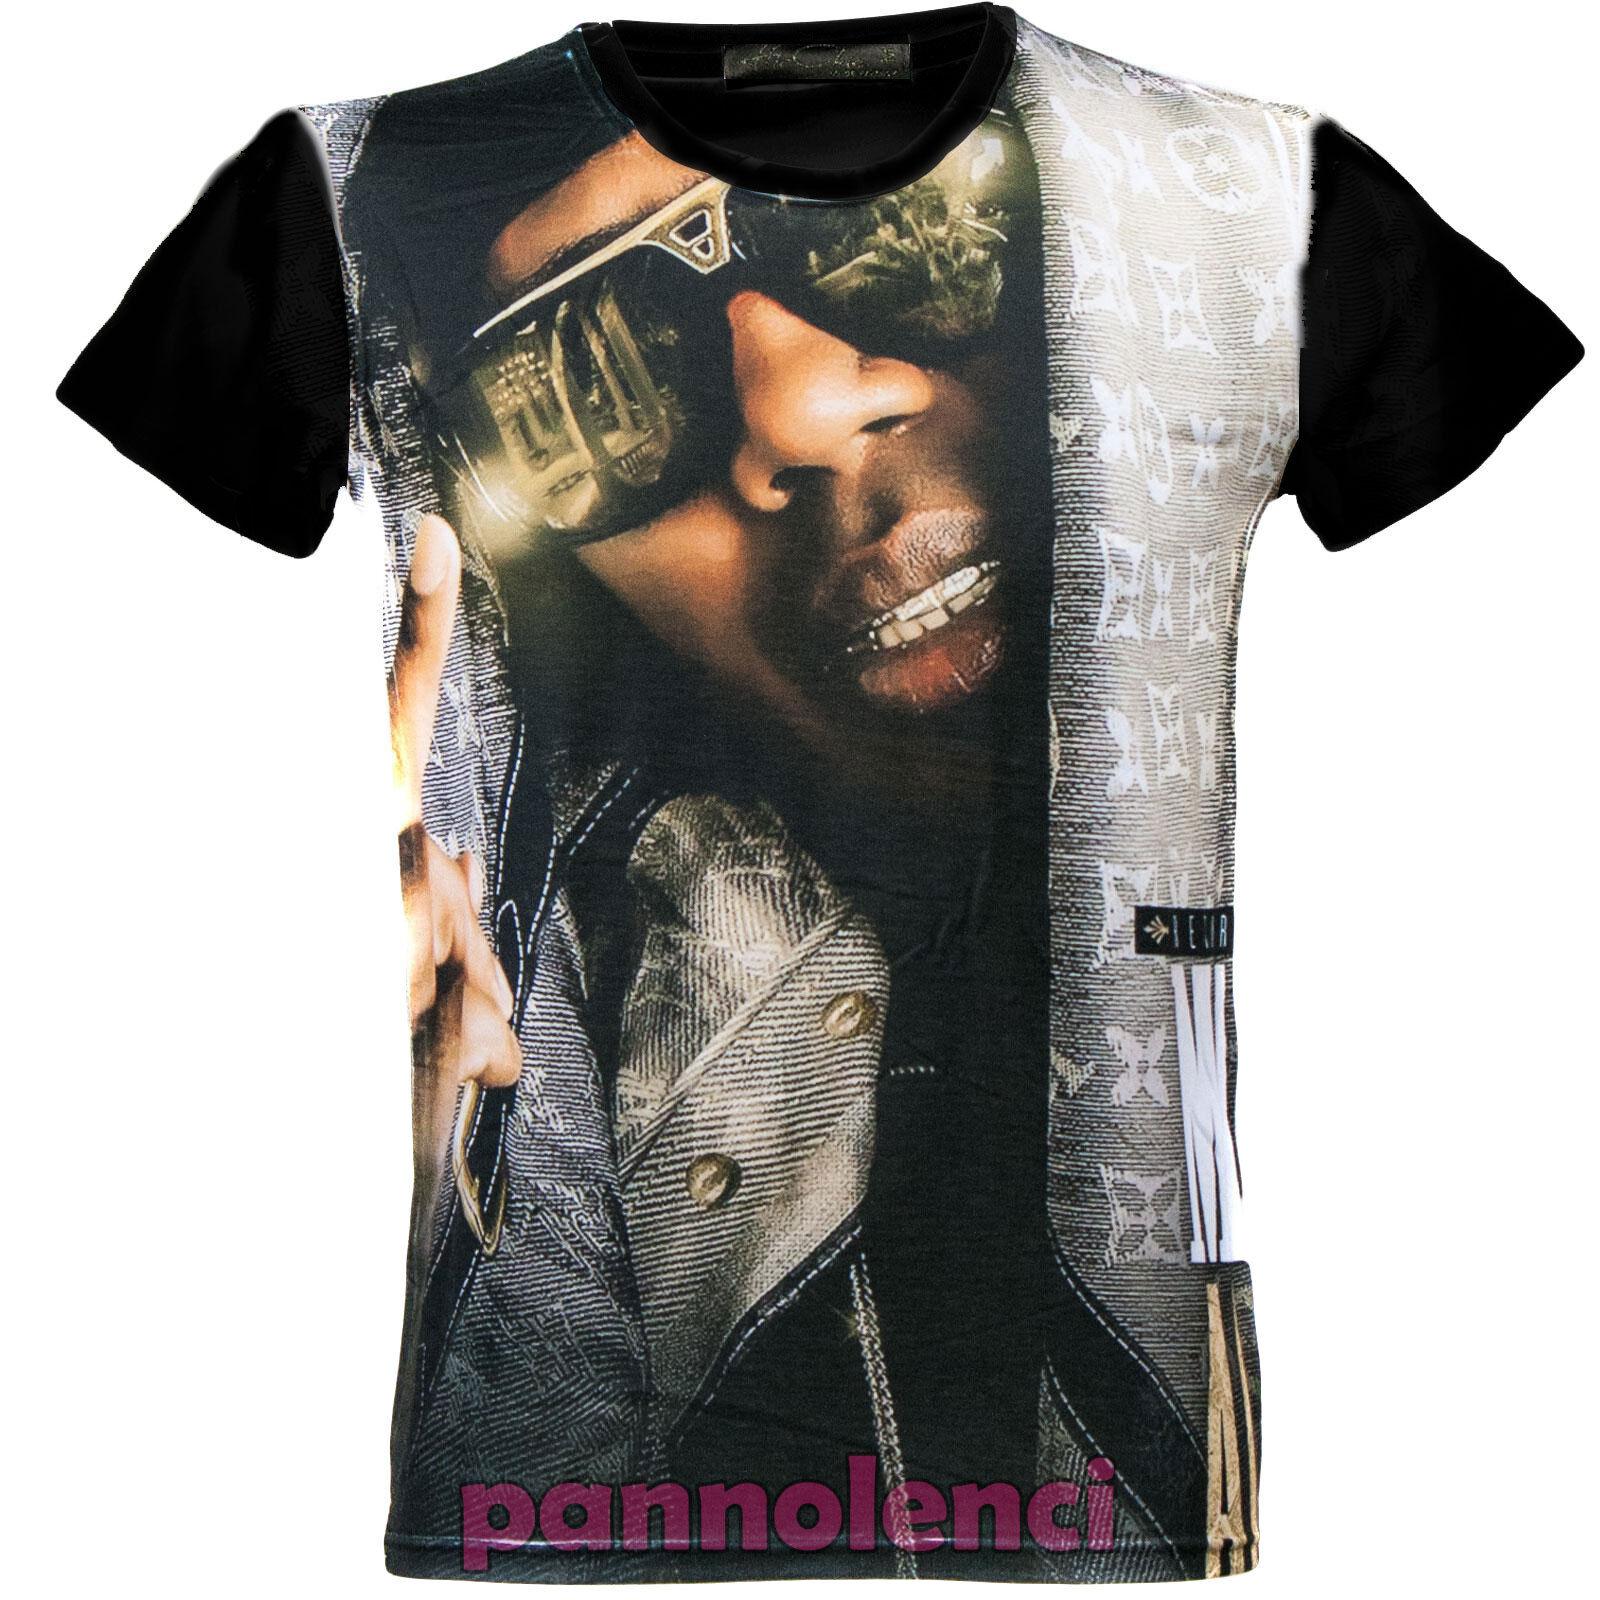 Rapero de rap camisa camiseta hombre camiseta Made Italy sublimatic ABU-138   base blanco 80b5167ce5960